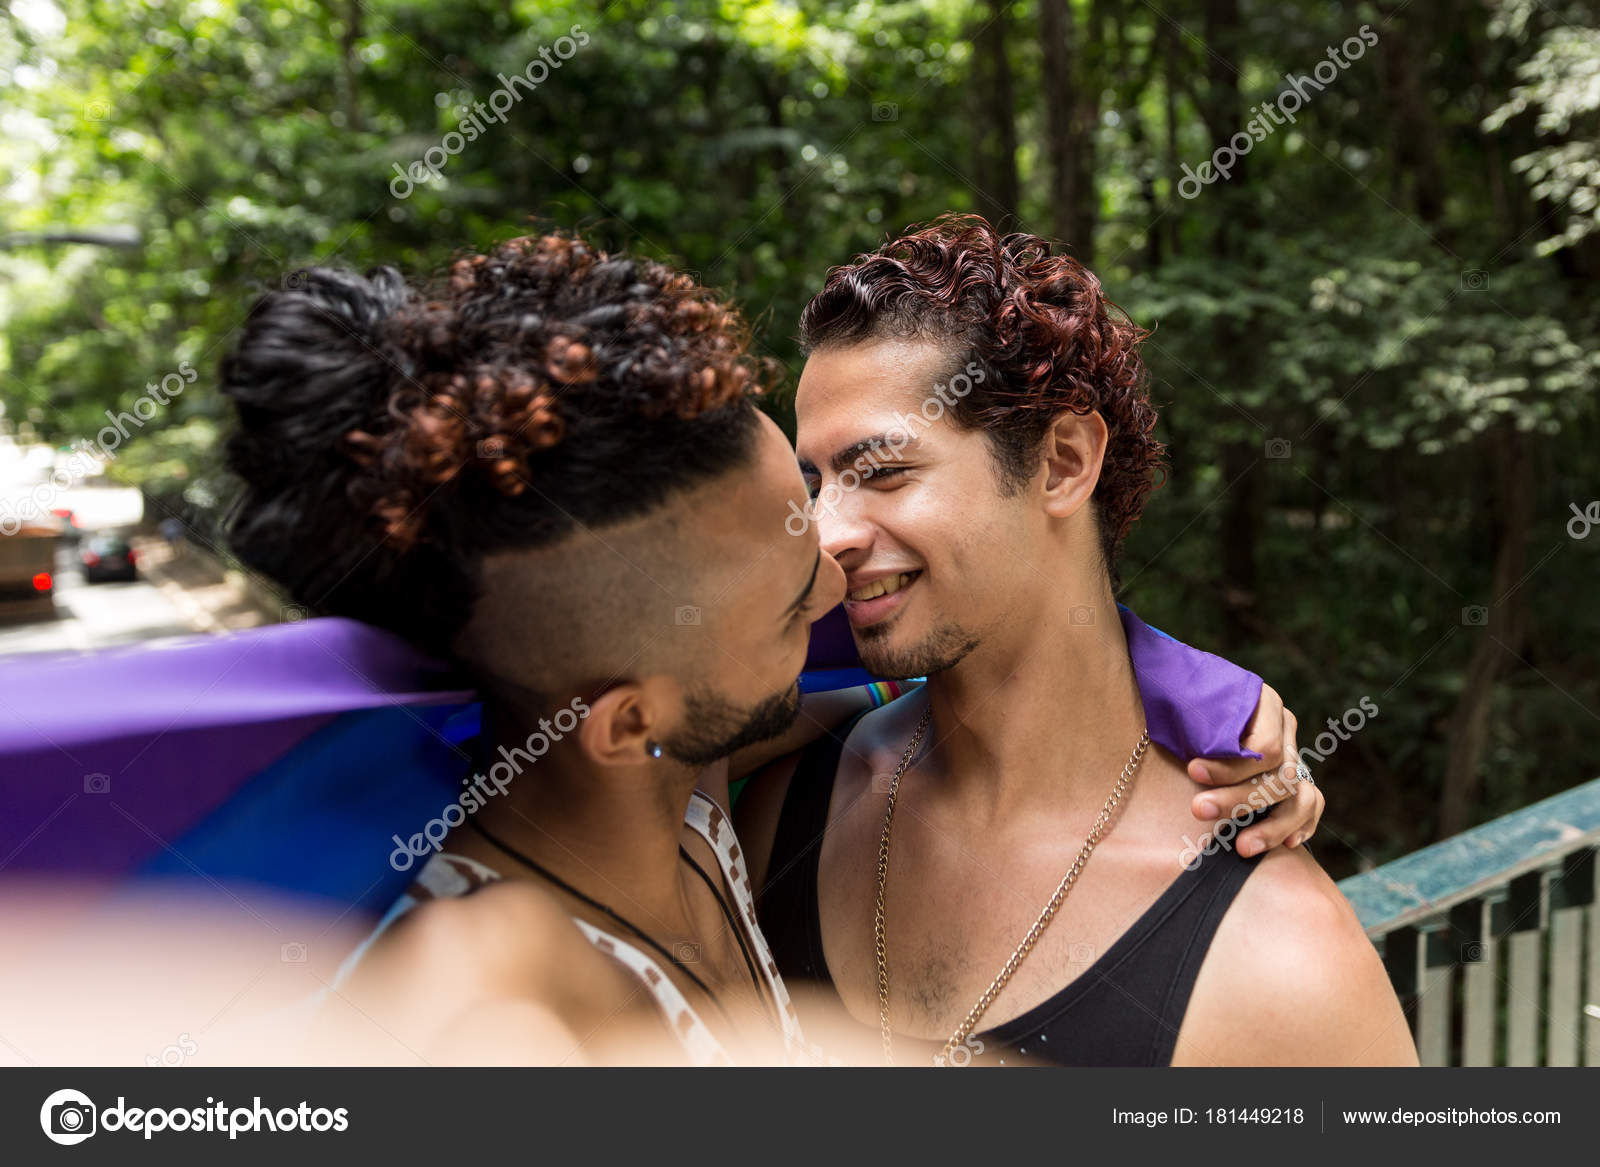 gay ζευγάρι ρομαντικό σεξμαμά 30 σεξ XXX